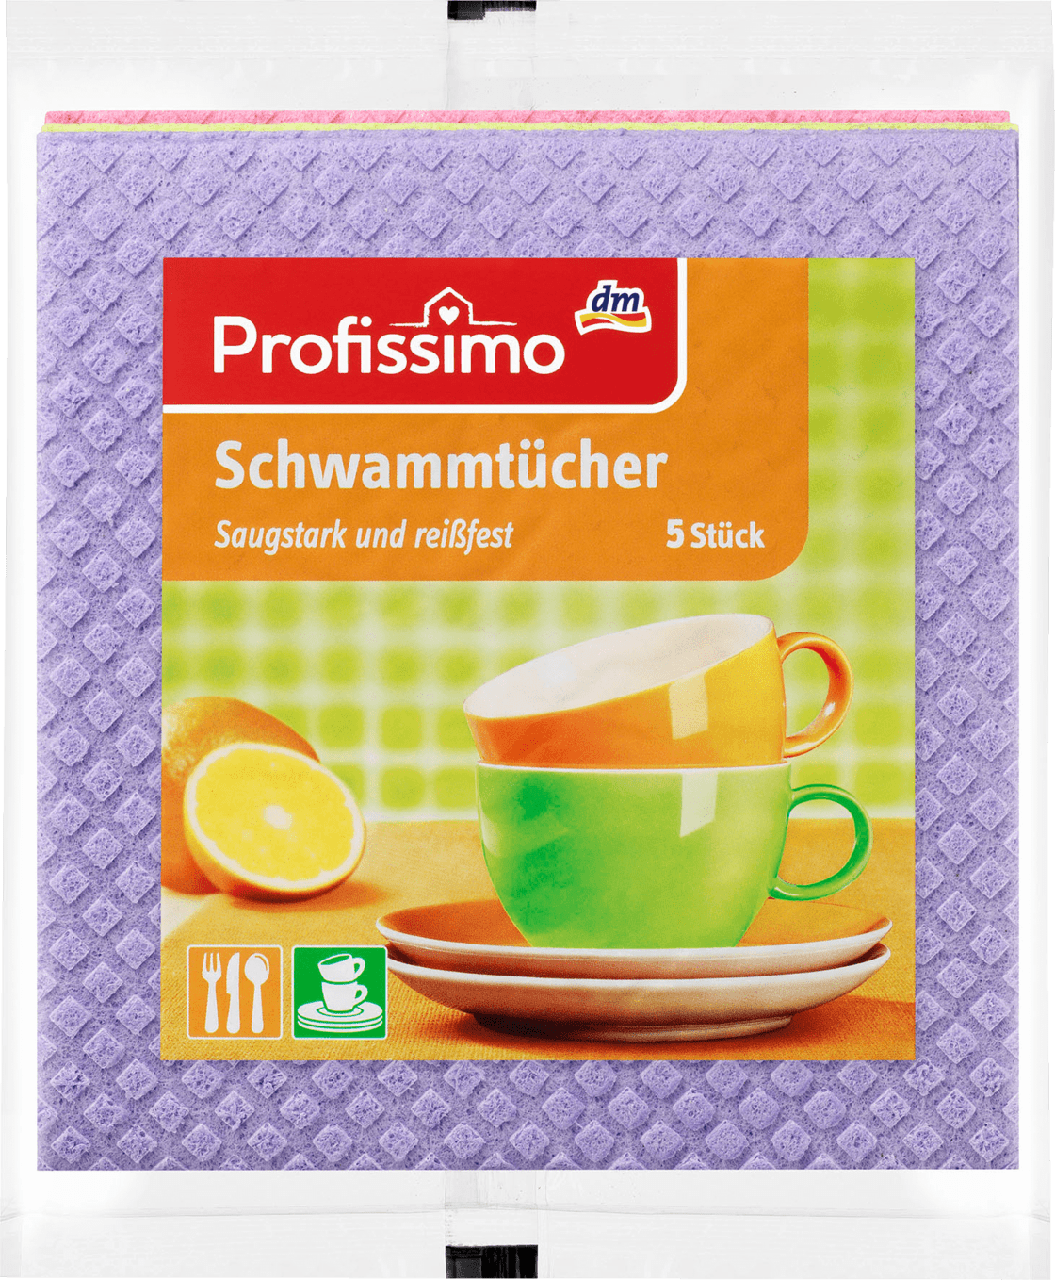 Губчатые салфетки для дома Profissimo, 5 шт., фото 1